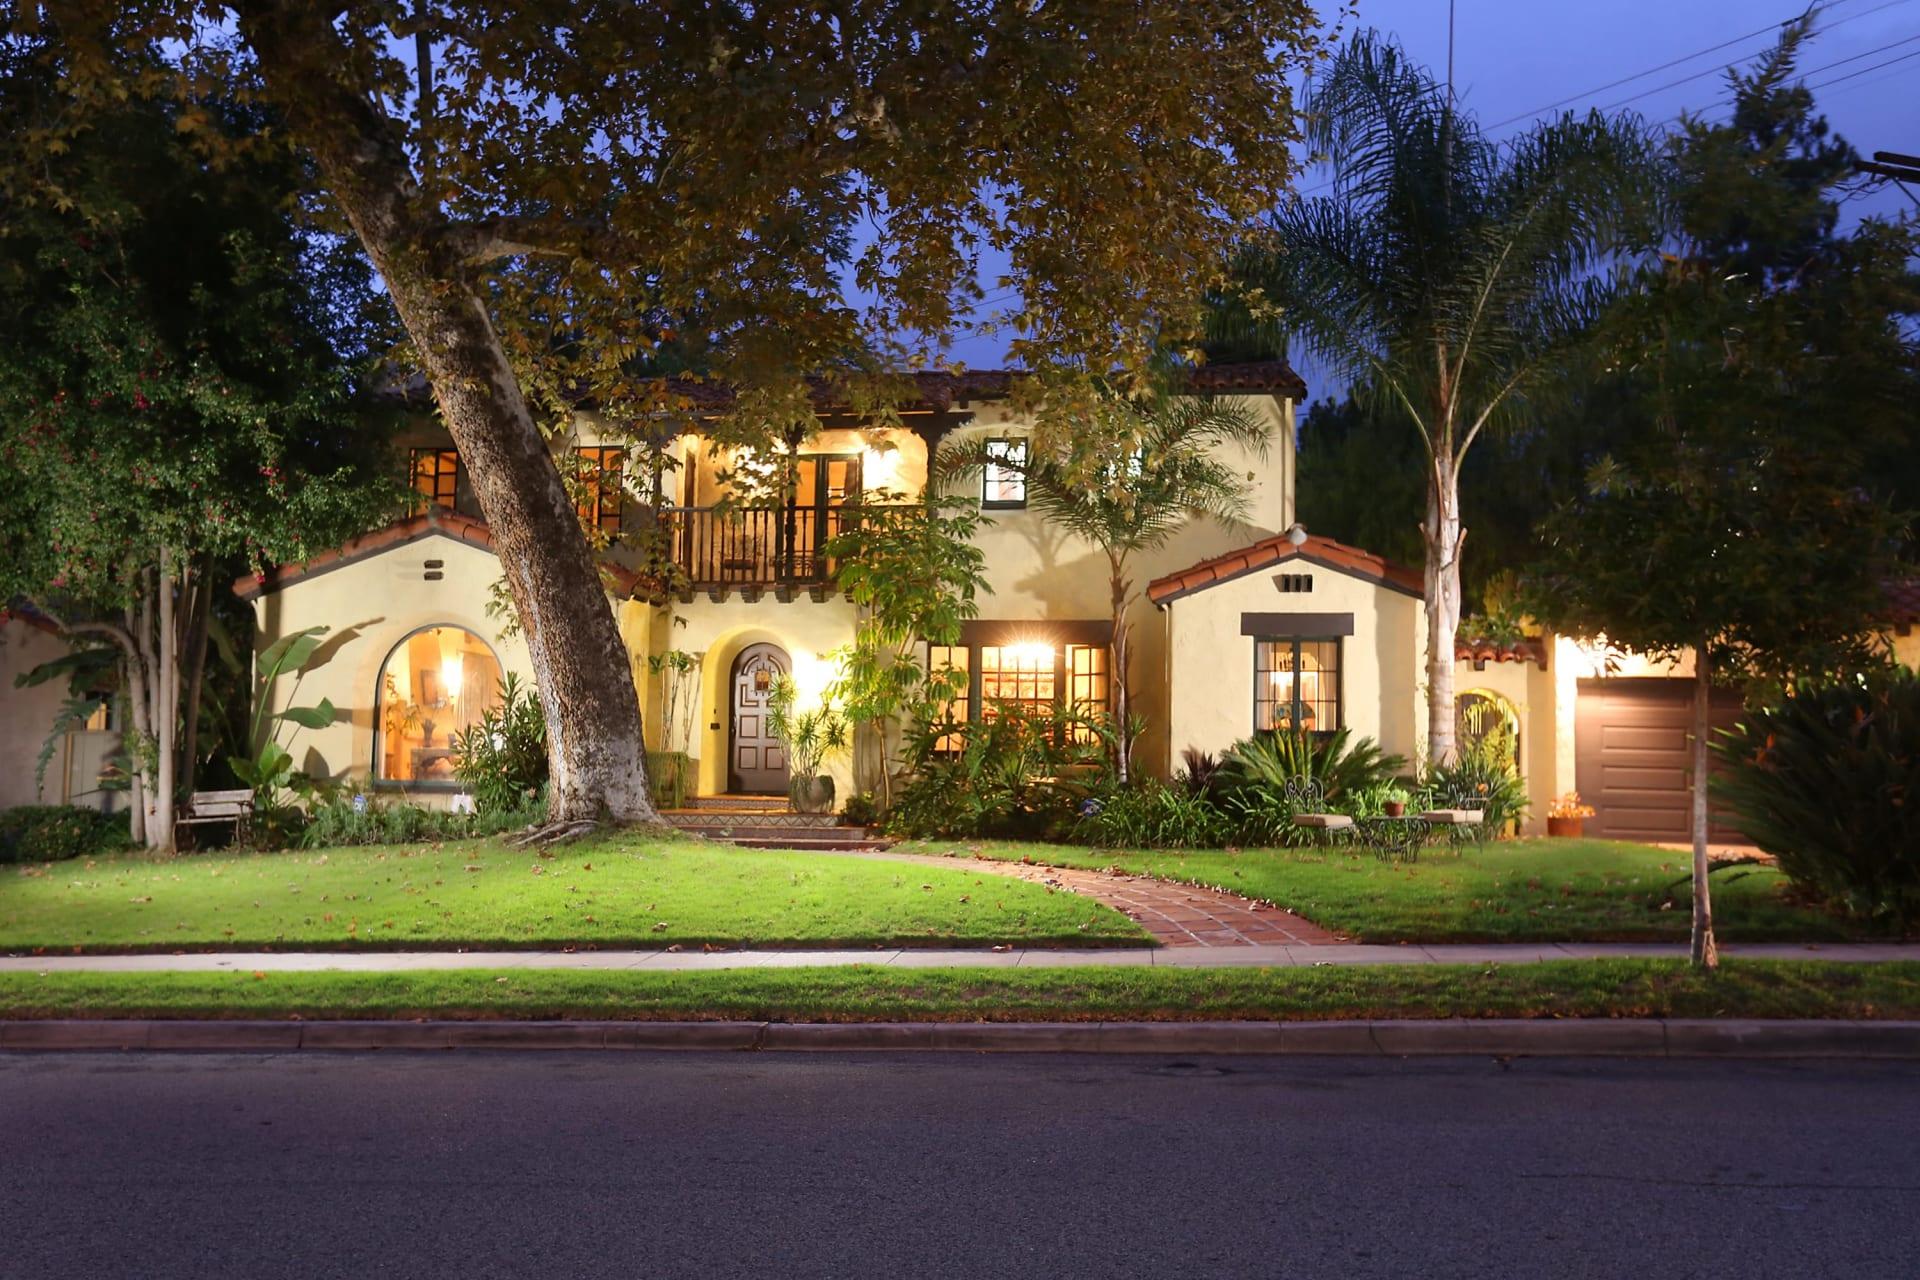 SOLD BY EDWIN ORDUBEGIAN | 1251 Rossmoyne Ave. Glendale. Character Spanish House in Glendale video preview